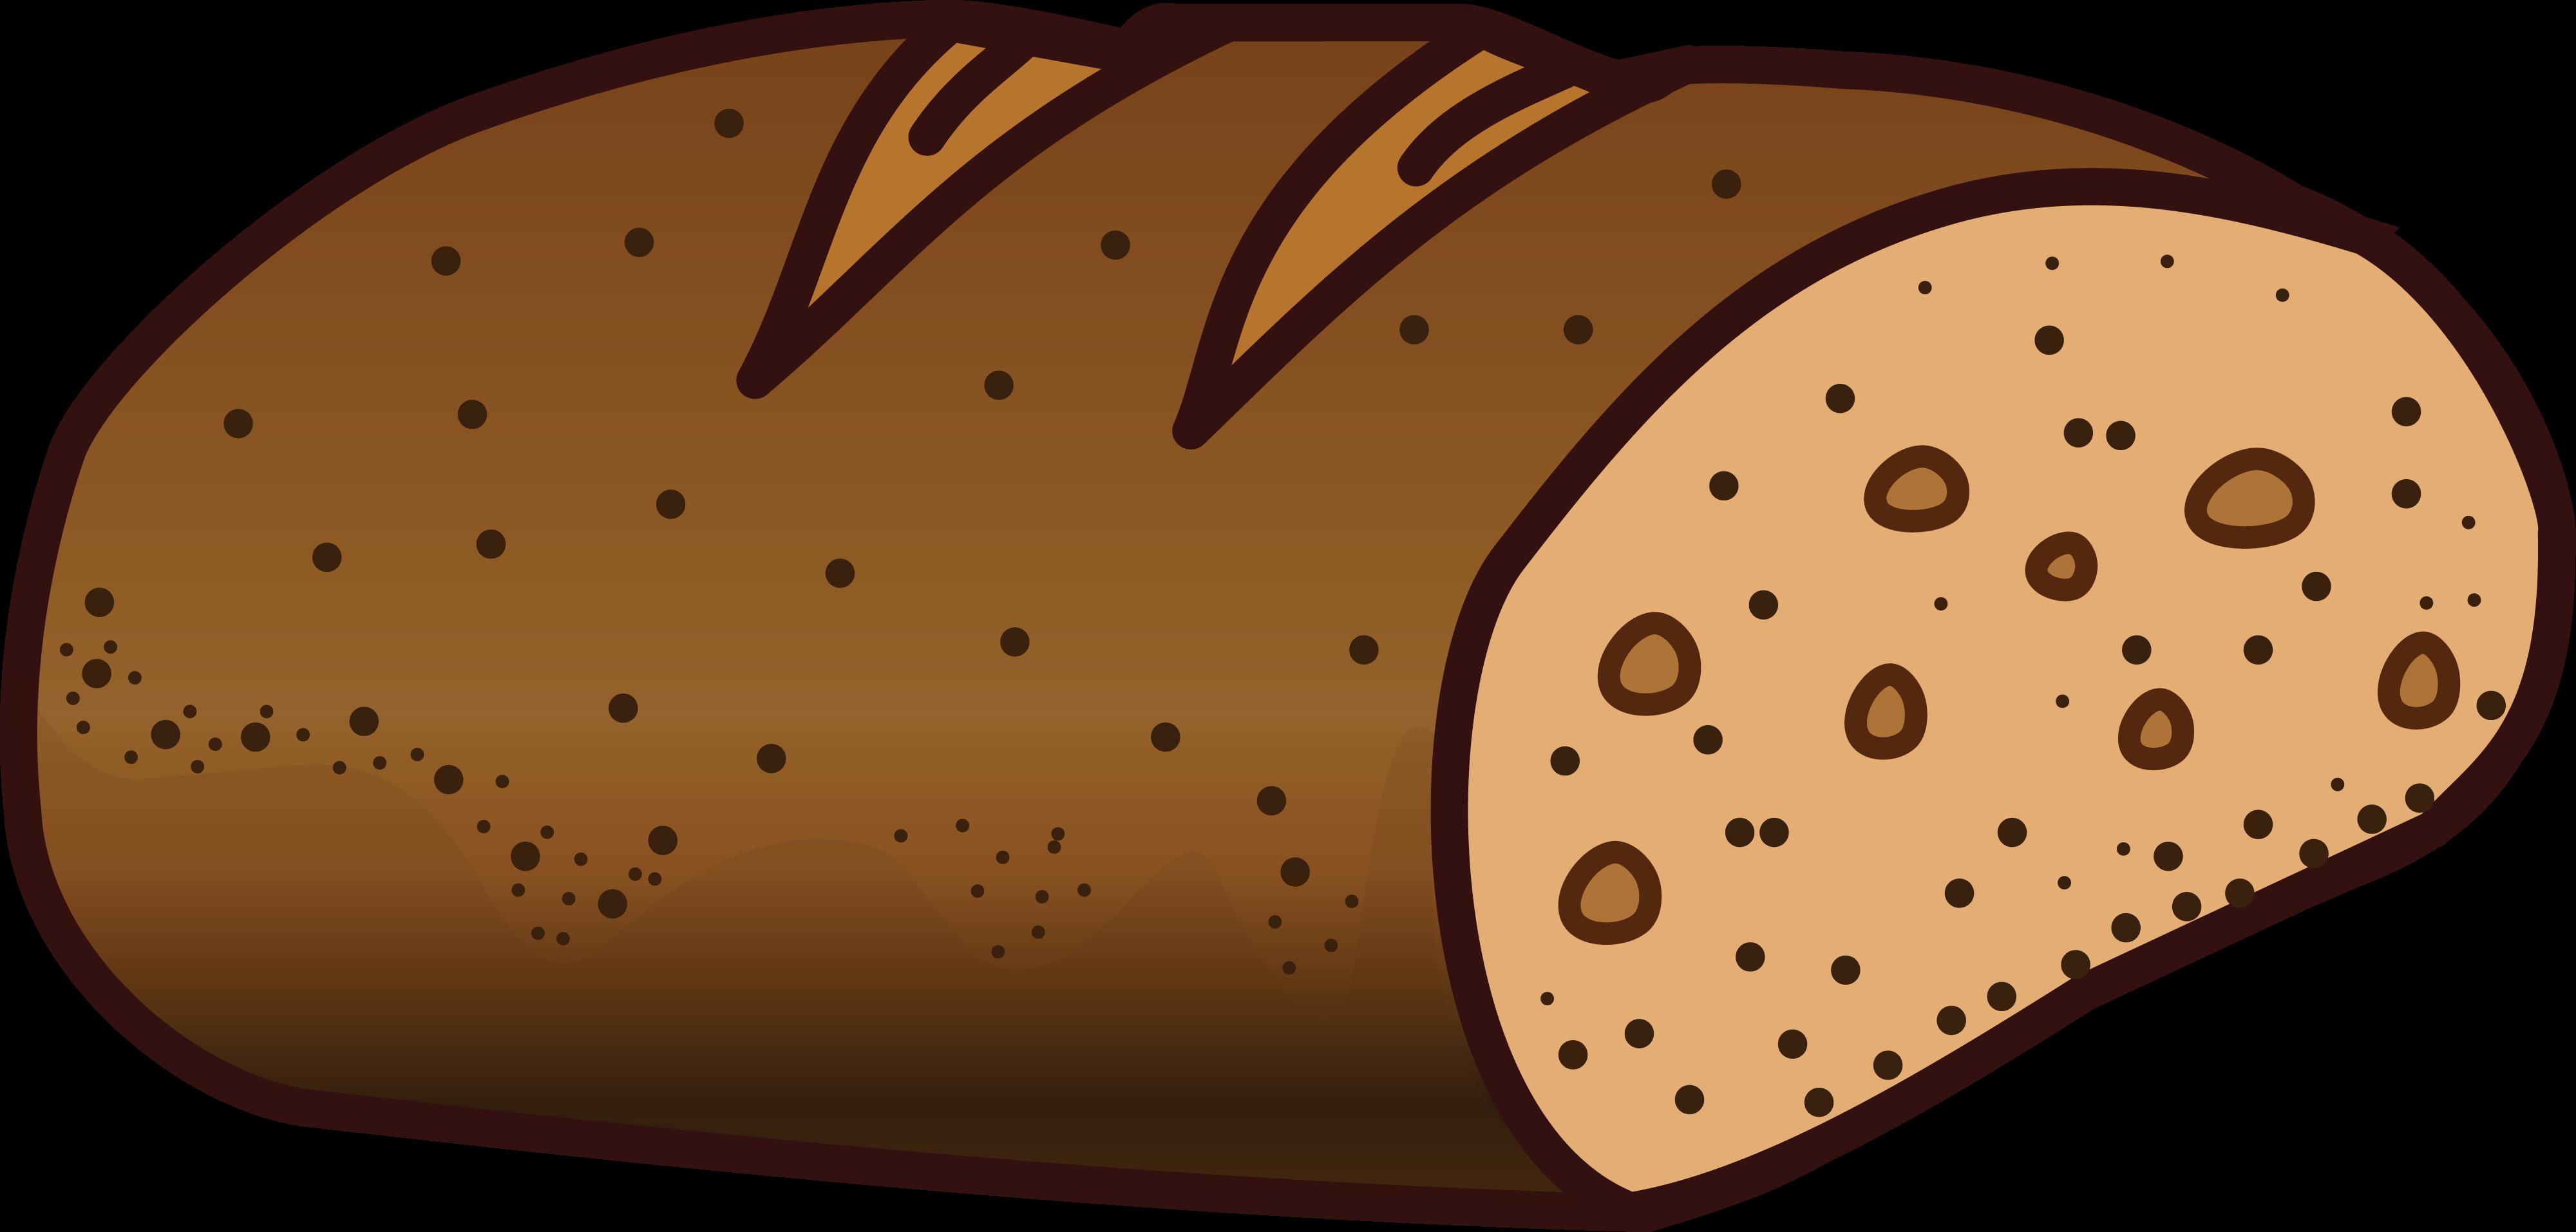 Free Clipart Of Bread Clipart Bread.